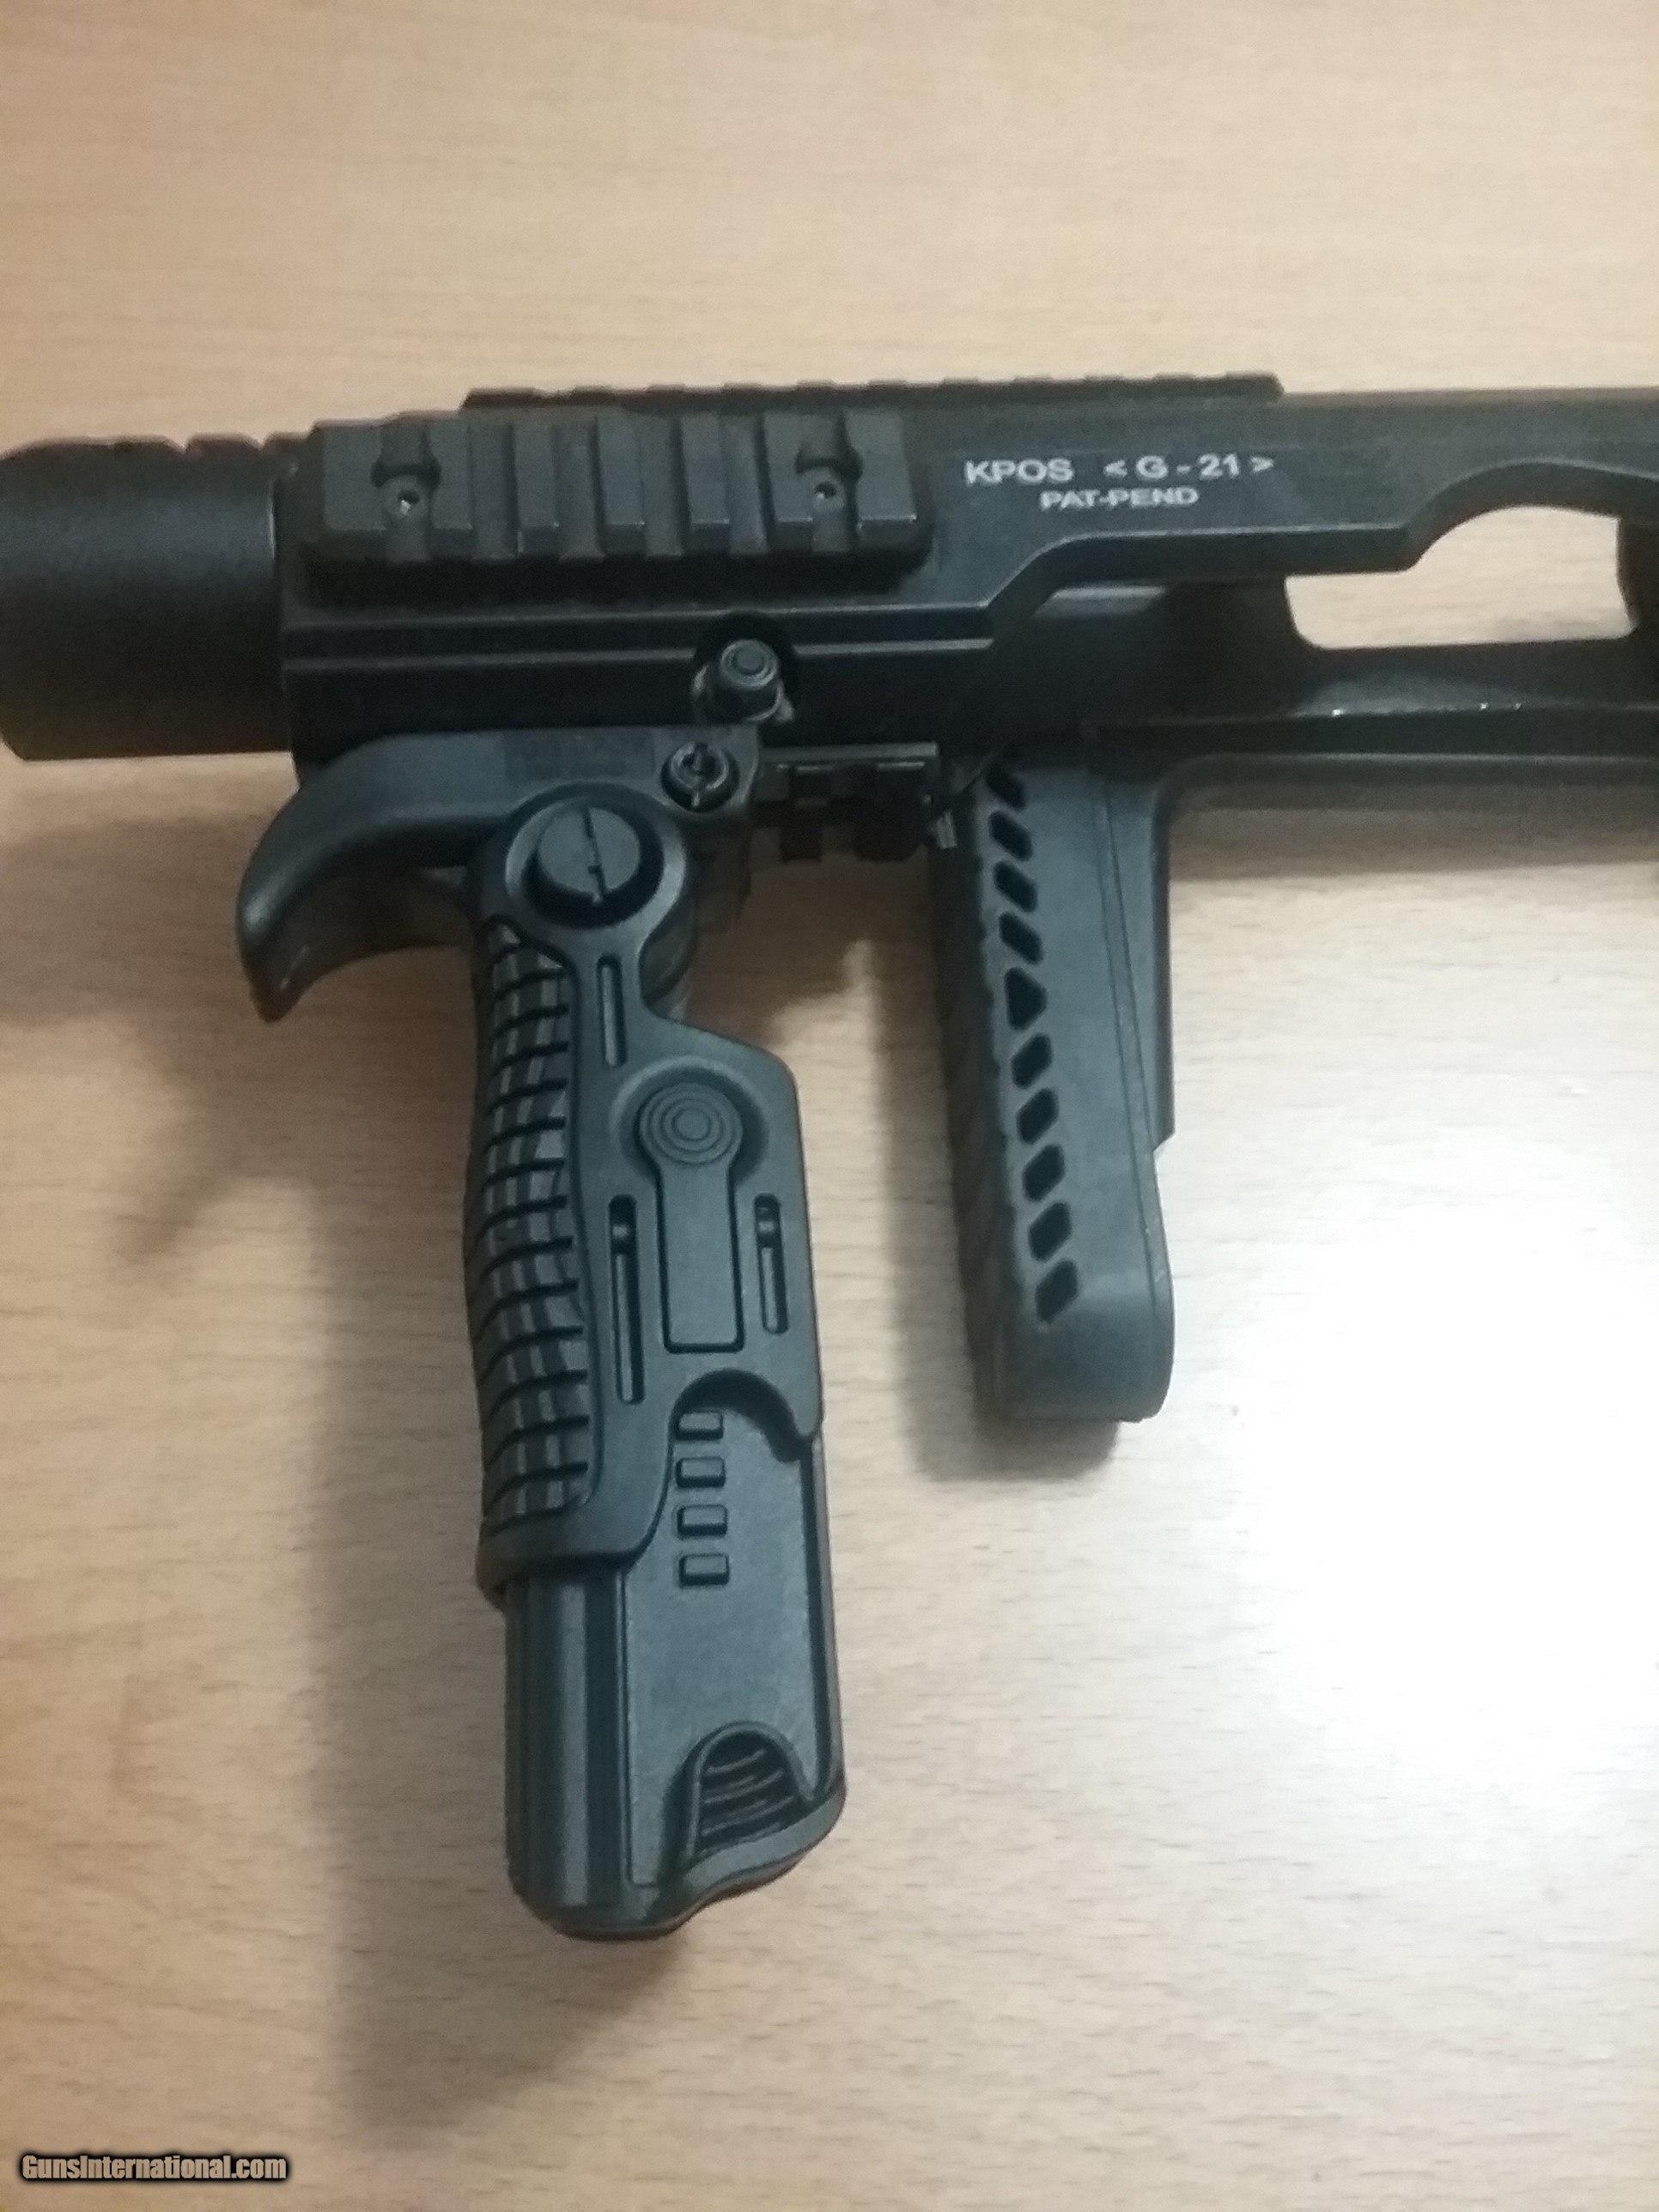 FAB Defense (MAKO) KPOS P D W  Conversion-Kit for Glock 21